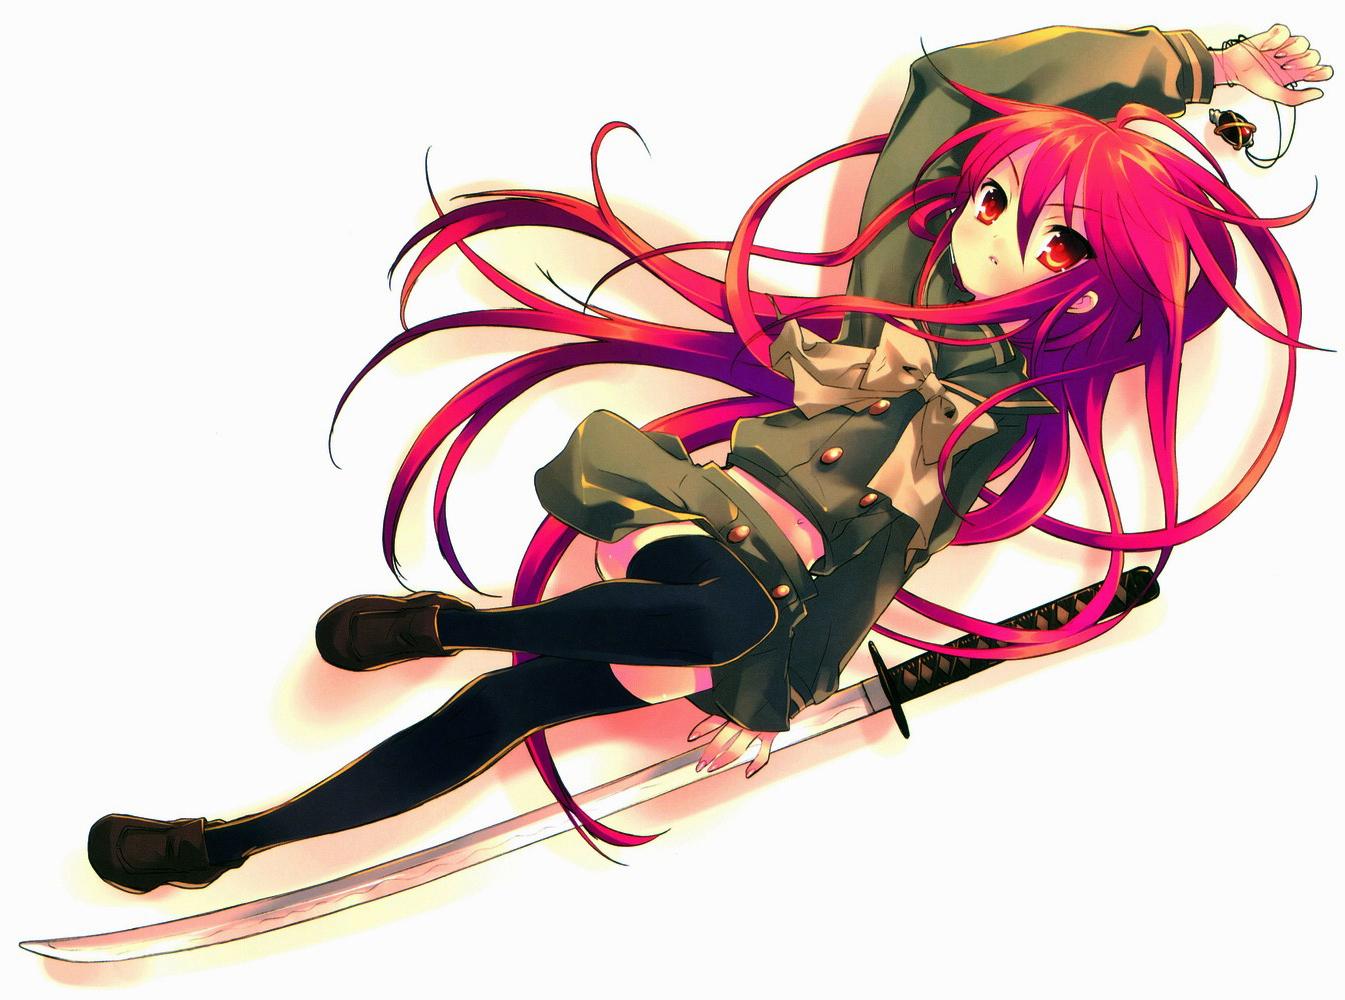 alastor necklace red_eyes red_hair school_uniform shakugan_no_shana shana skirt sword thighhighs weapon white